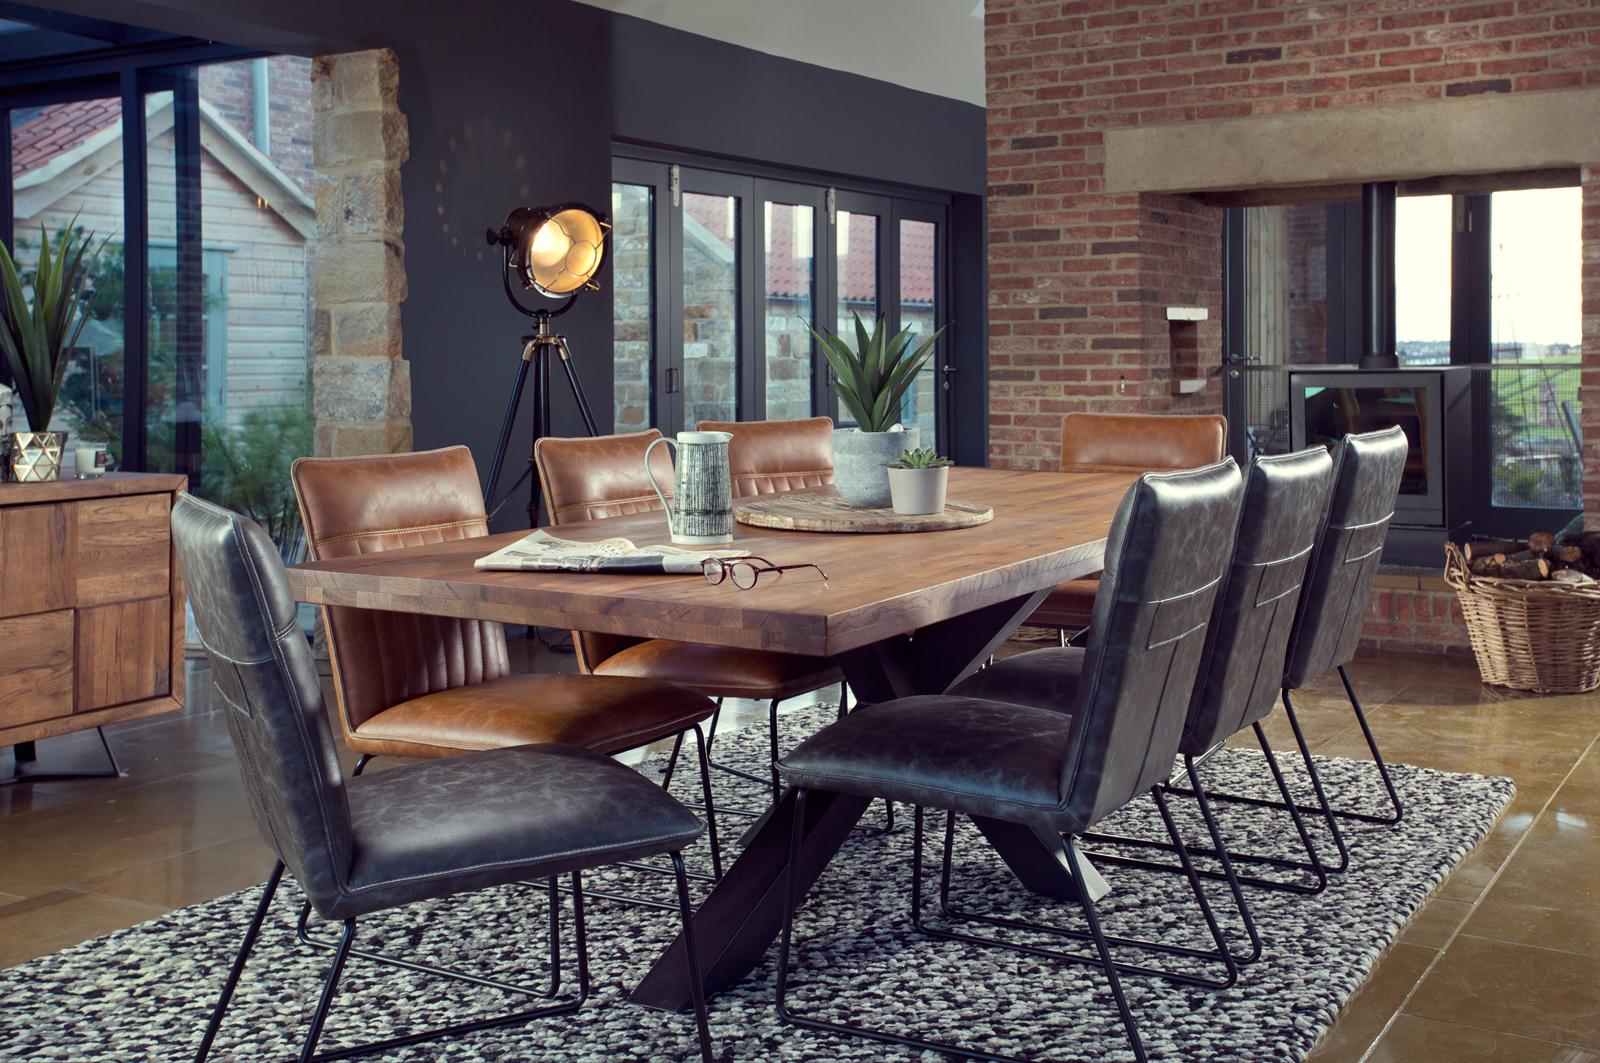 table salle a manger bois metal pied croise 240 cm oka